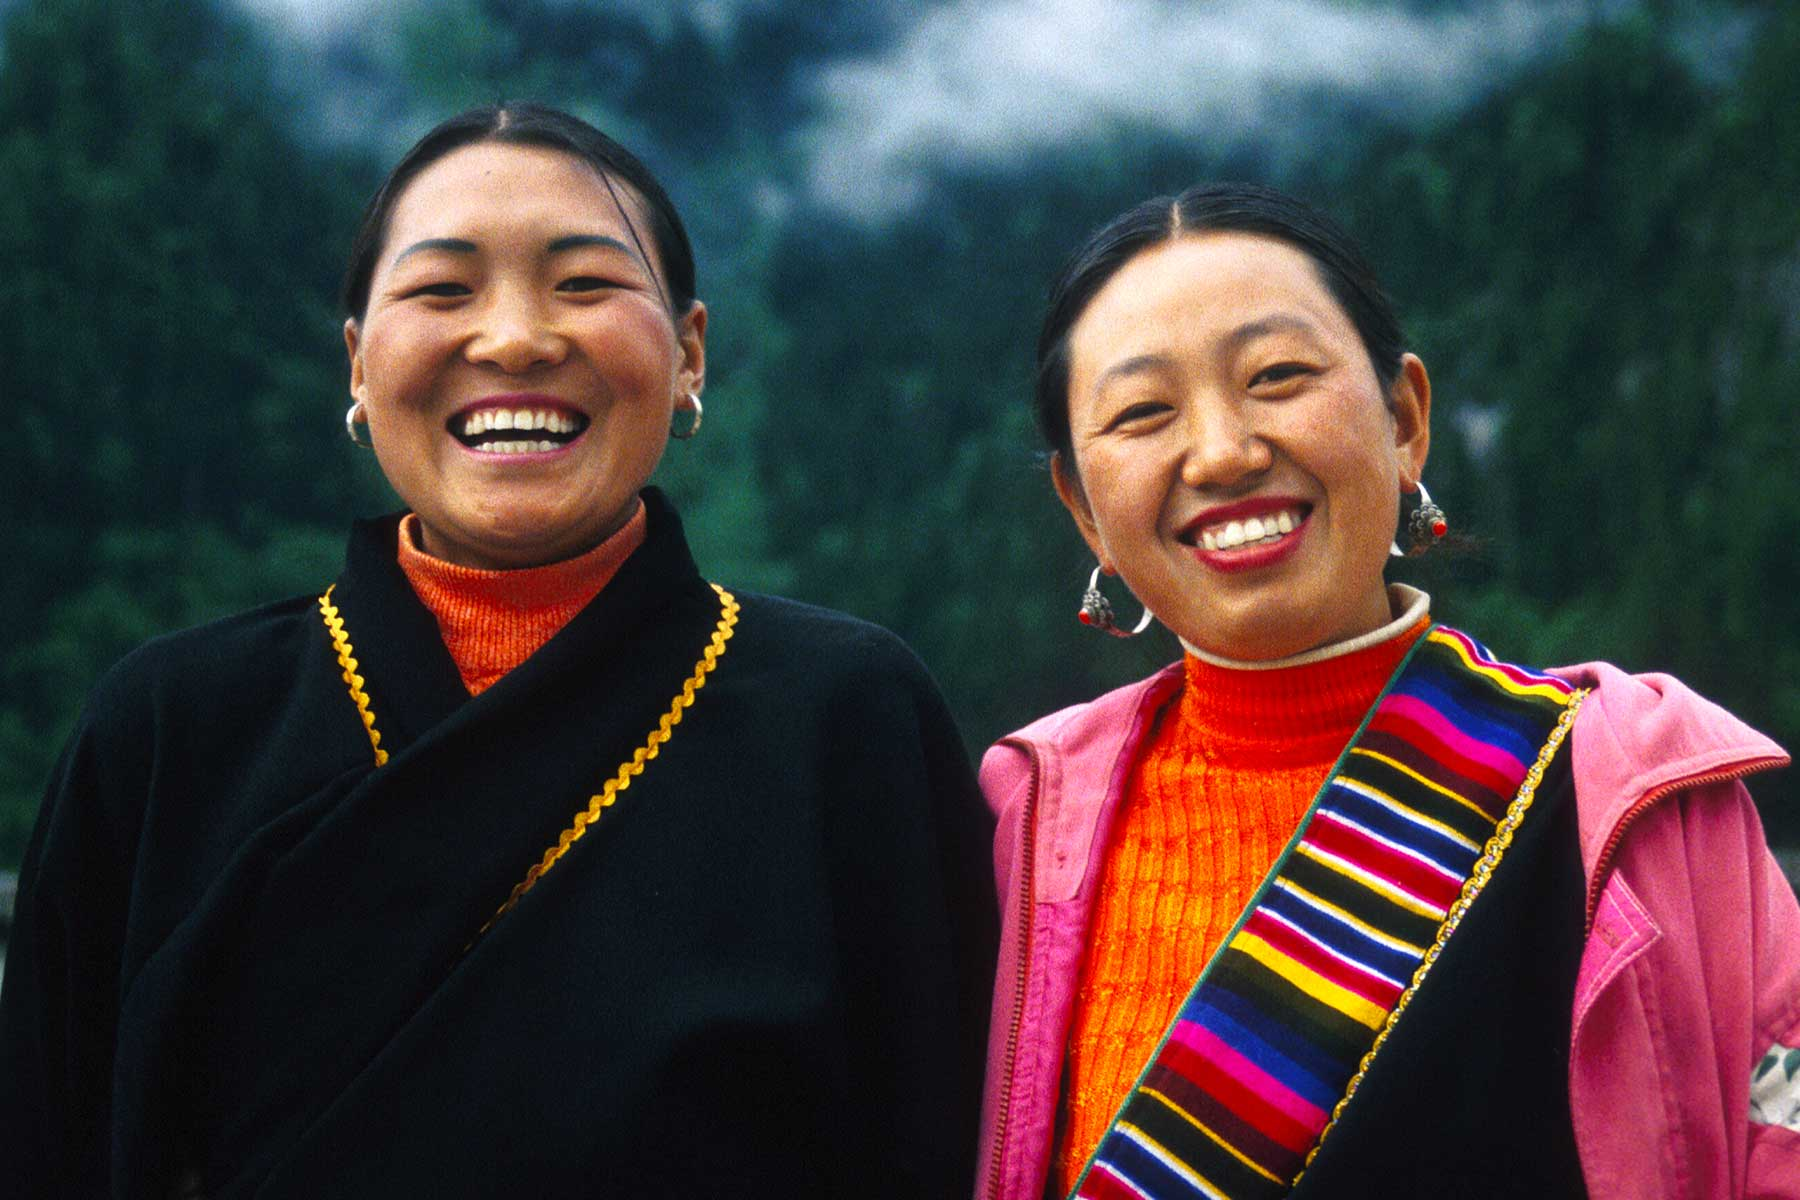 Eastern Civilization - Steven Andrew Martin - International Education Online - Tibetan Culture - Jiuzhaigou National Park - Sichuan Province, China